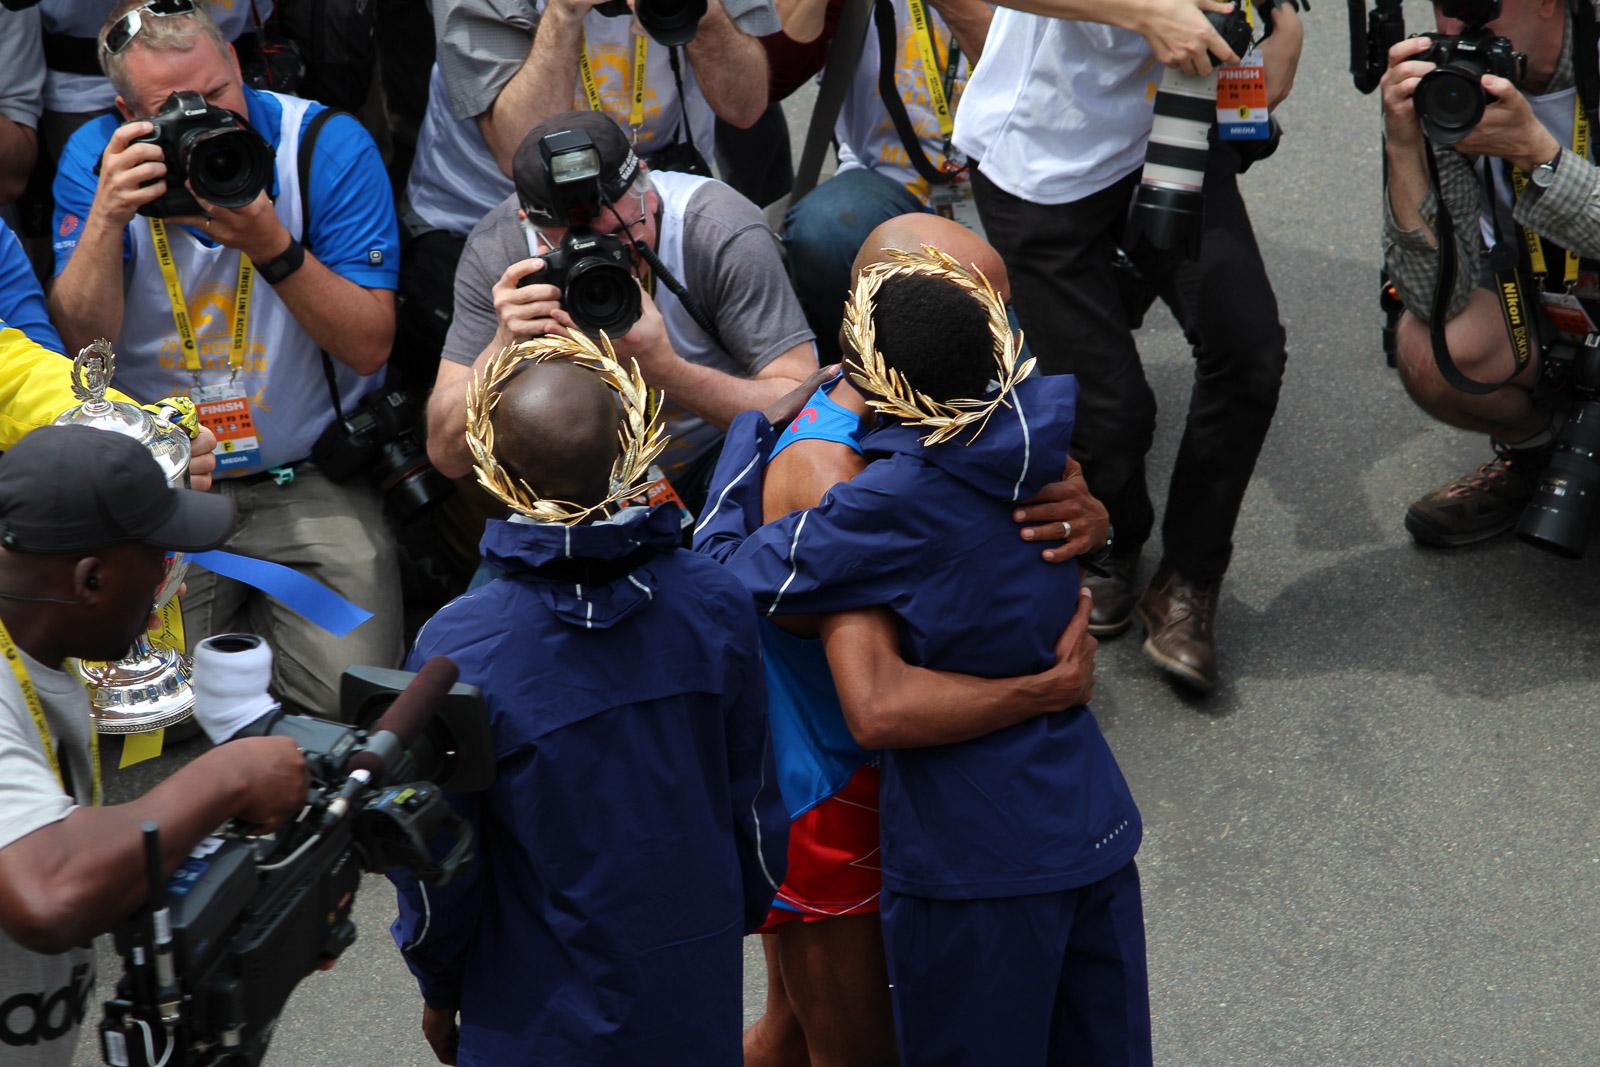 Meb hugs both winners of the Boston Marathon. Photo: Michael Doyle